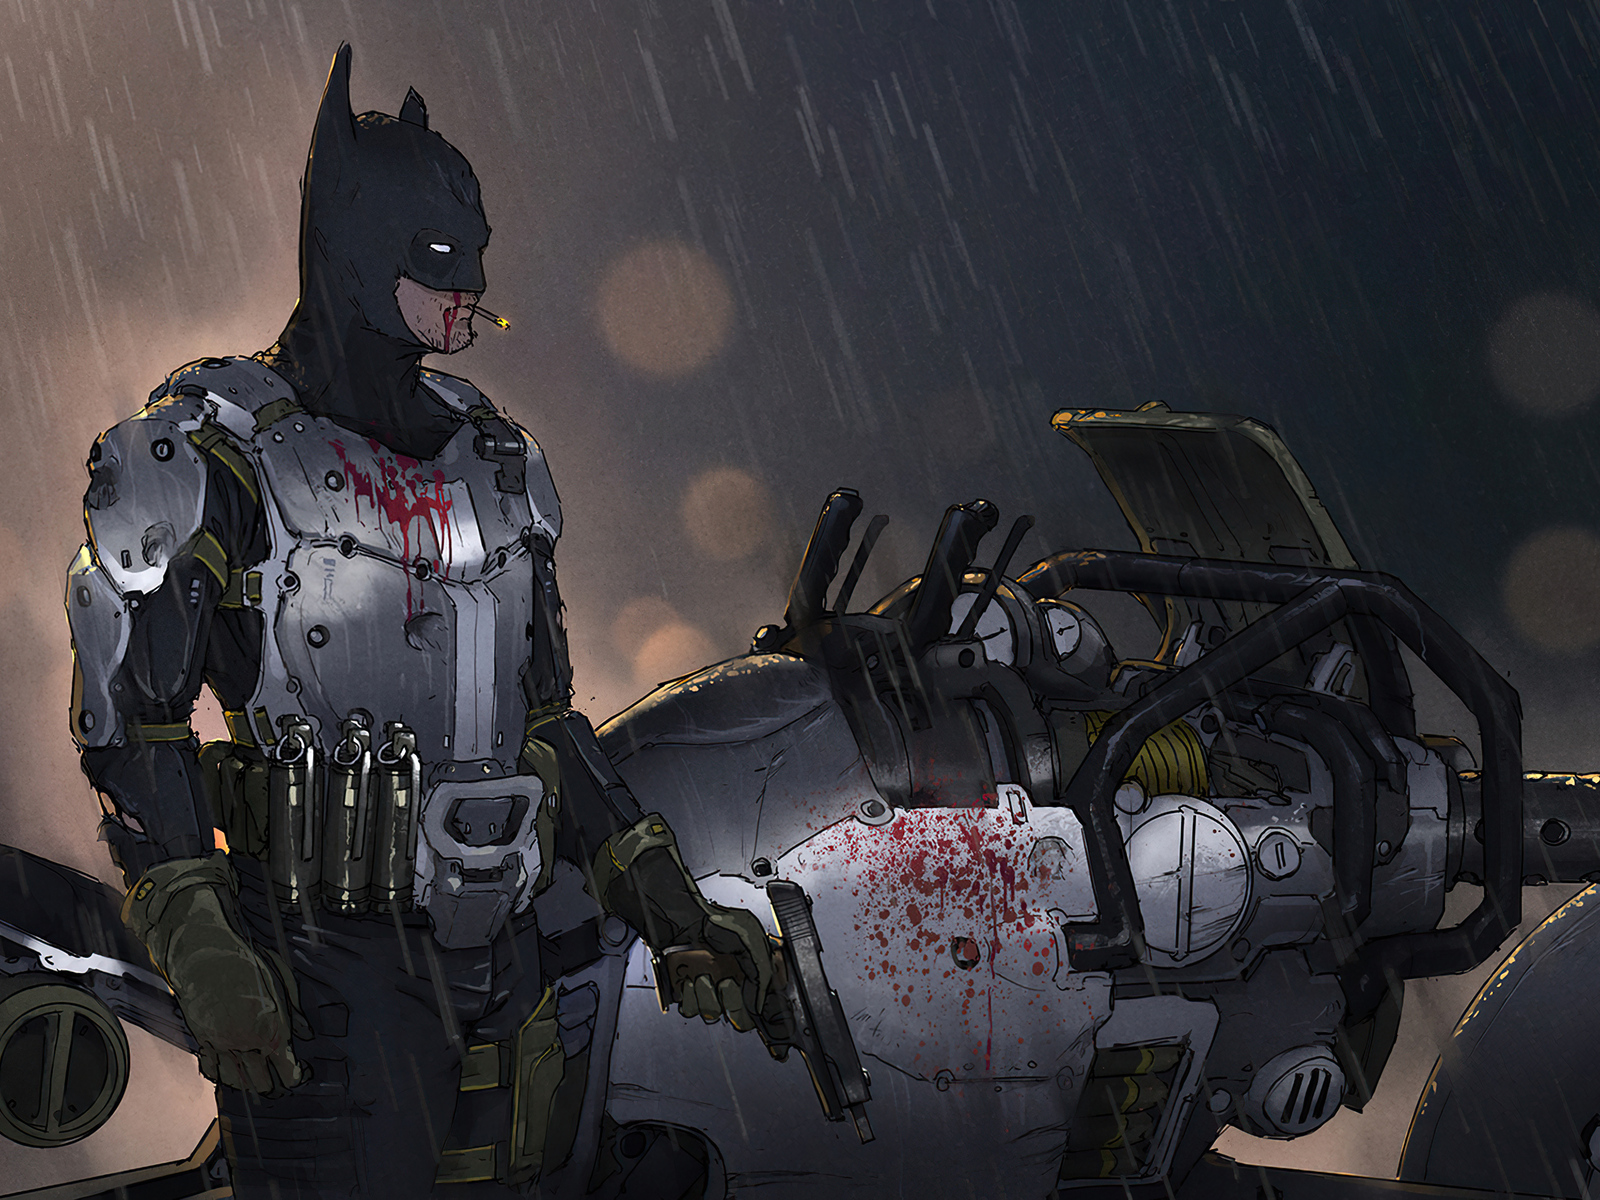 lo-fi-batman-4k-j9.jpg